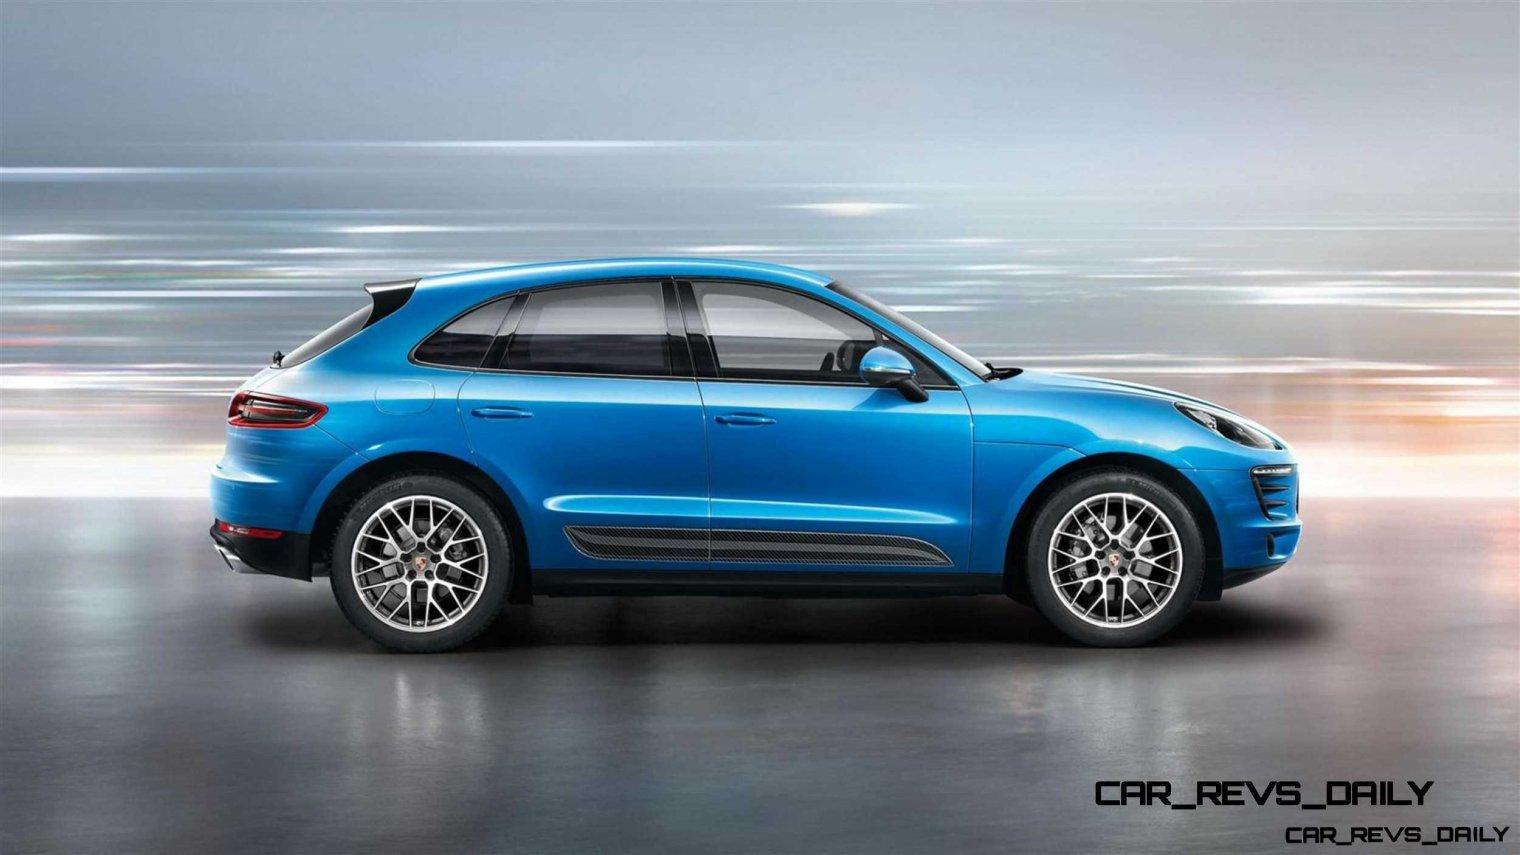 2015 Porsche Macan - Latest Images - CarRevsDaily.com 28